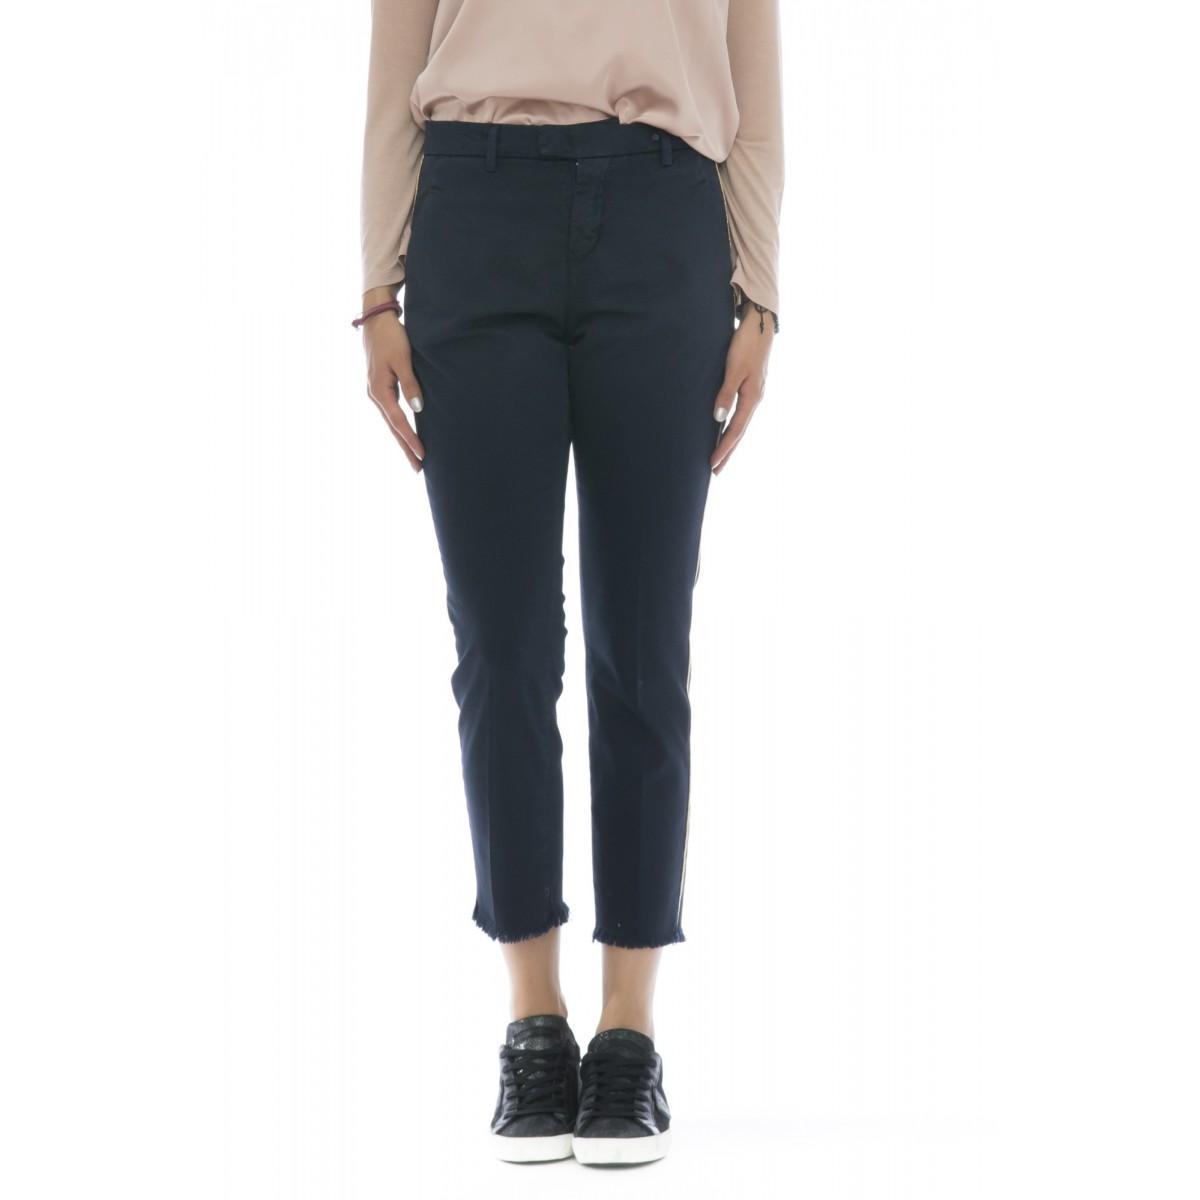 Pantalone donna - TRES pantalone color sfrangiato